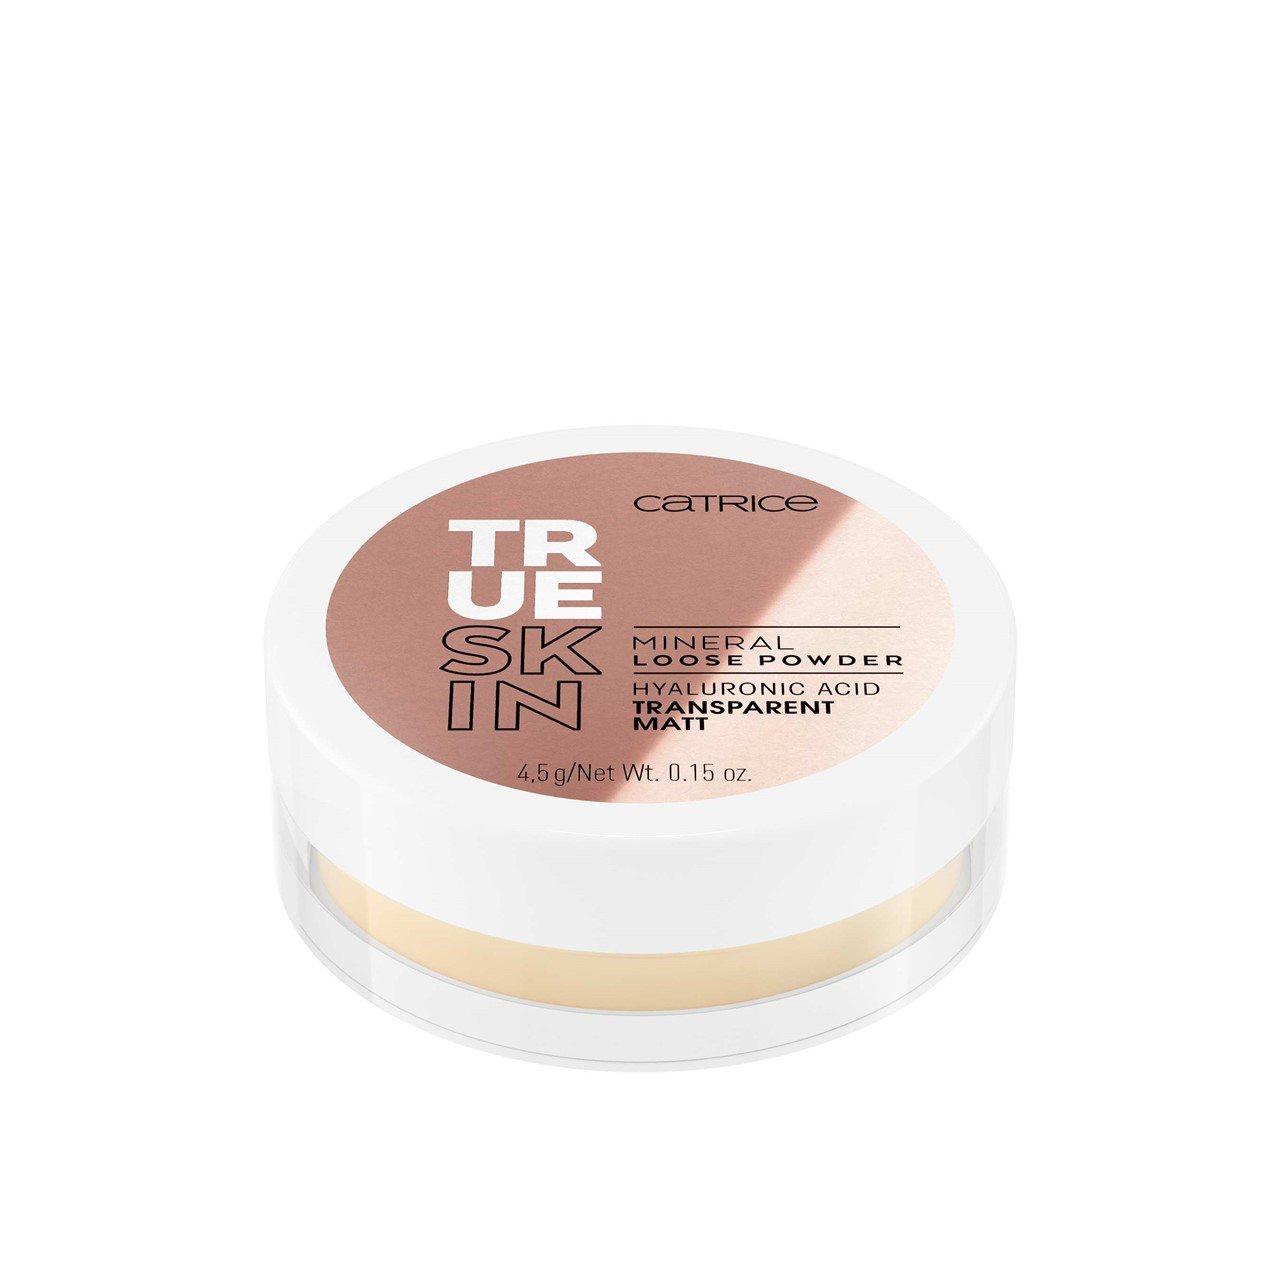 Catrice True Skin Mineral Loose Powder 20 Transparent Matt 20.20g